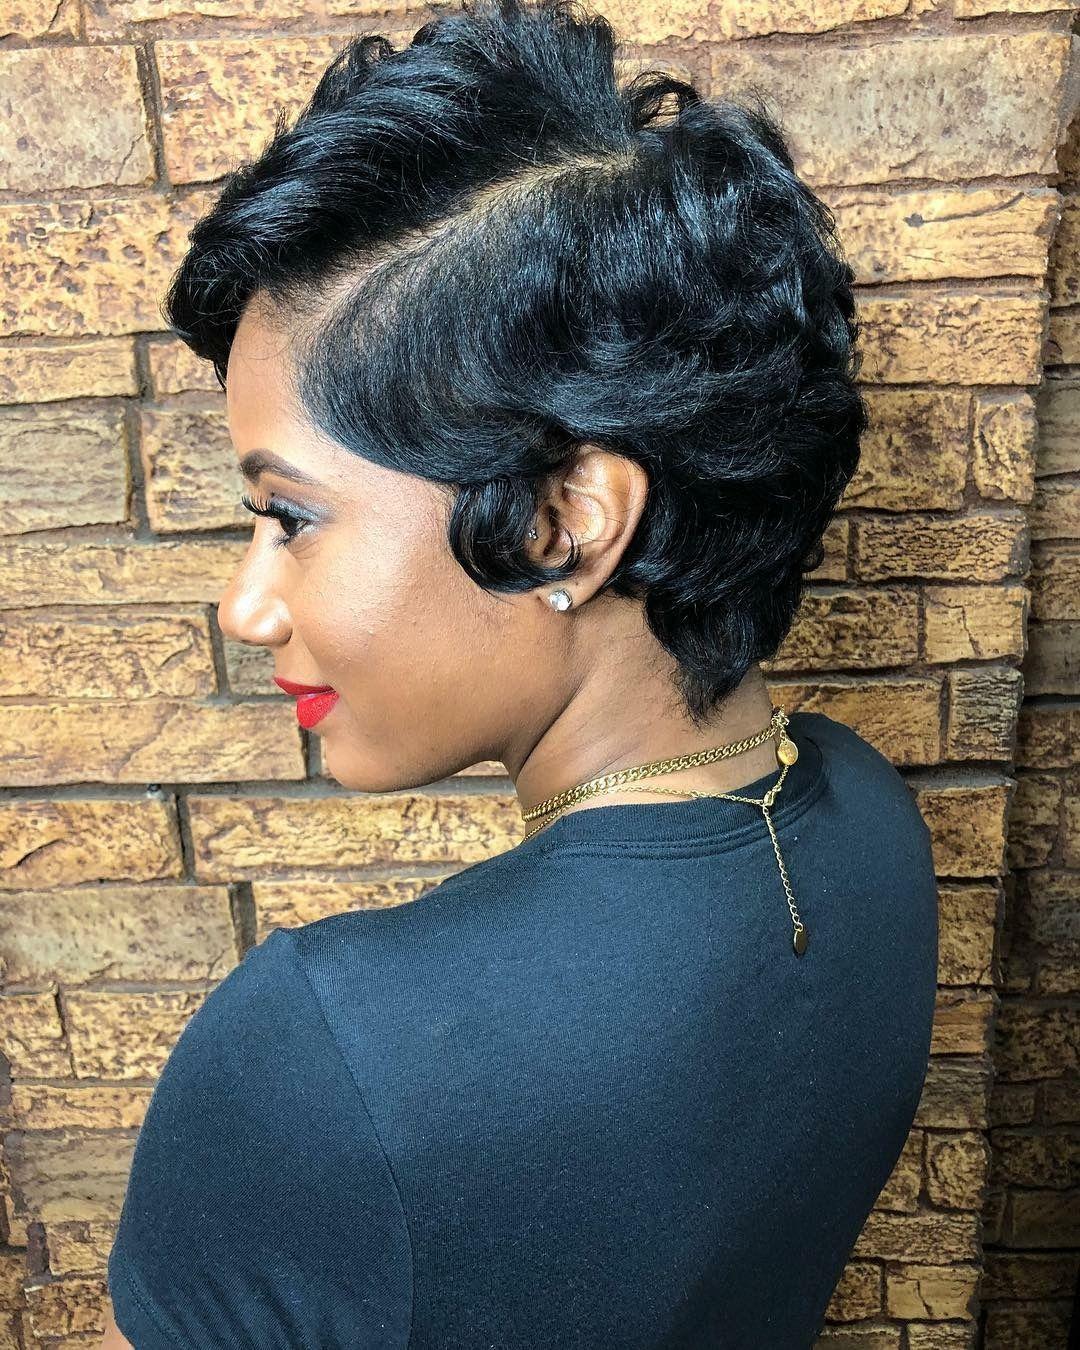 pinkristel foreman on hair lyfe  medium hair styles